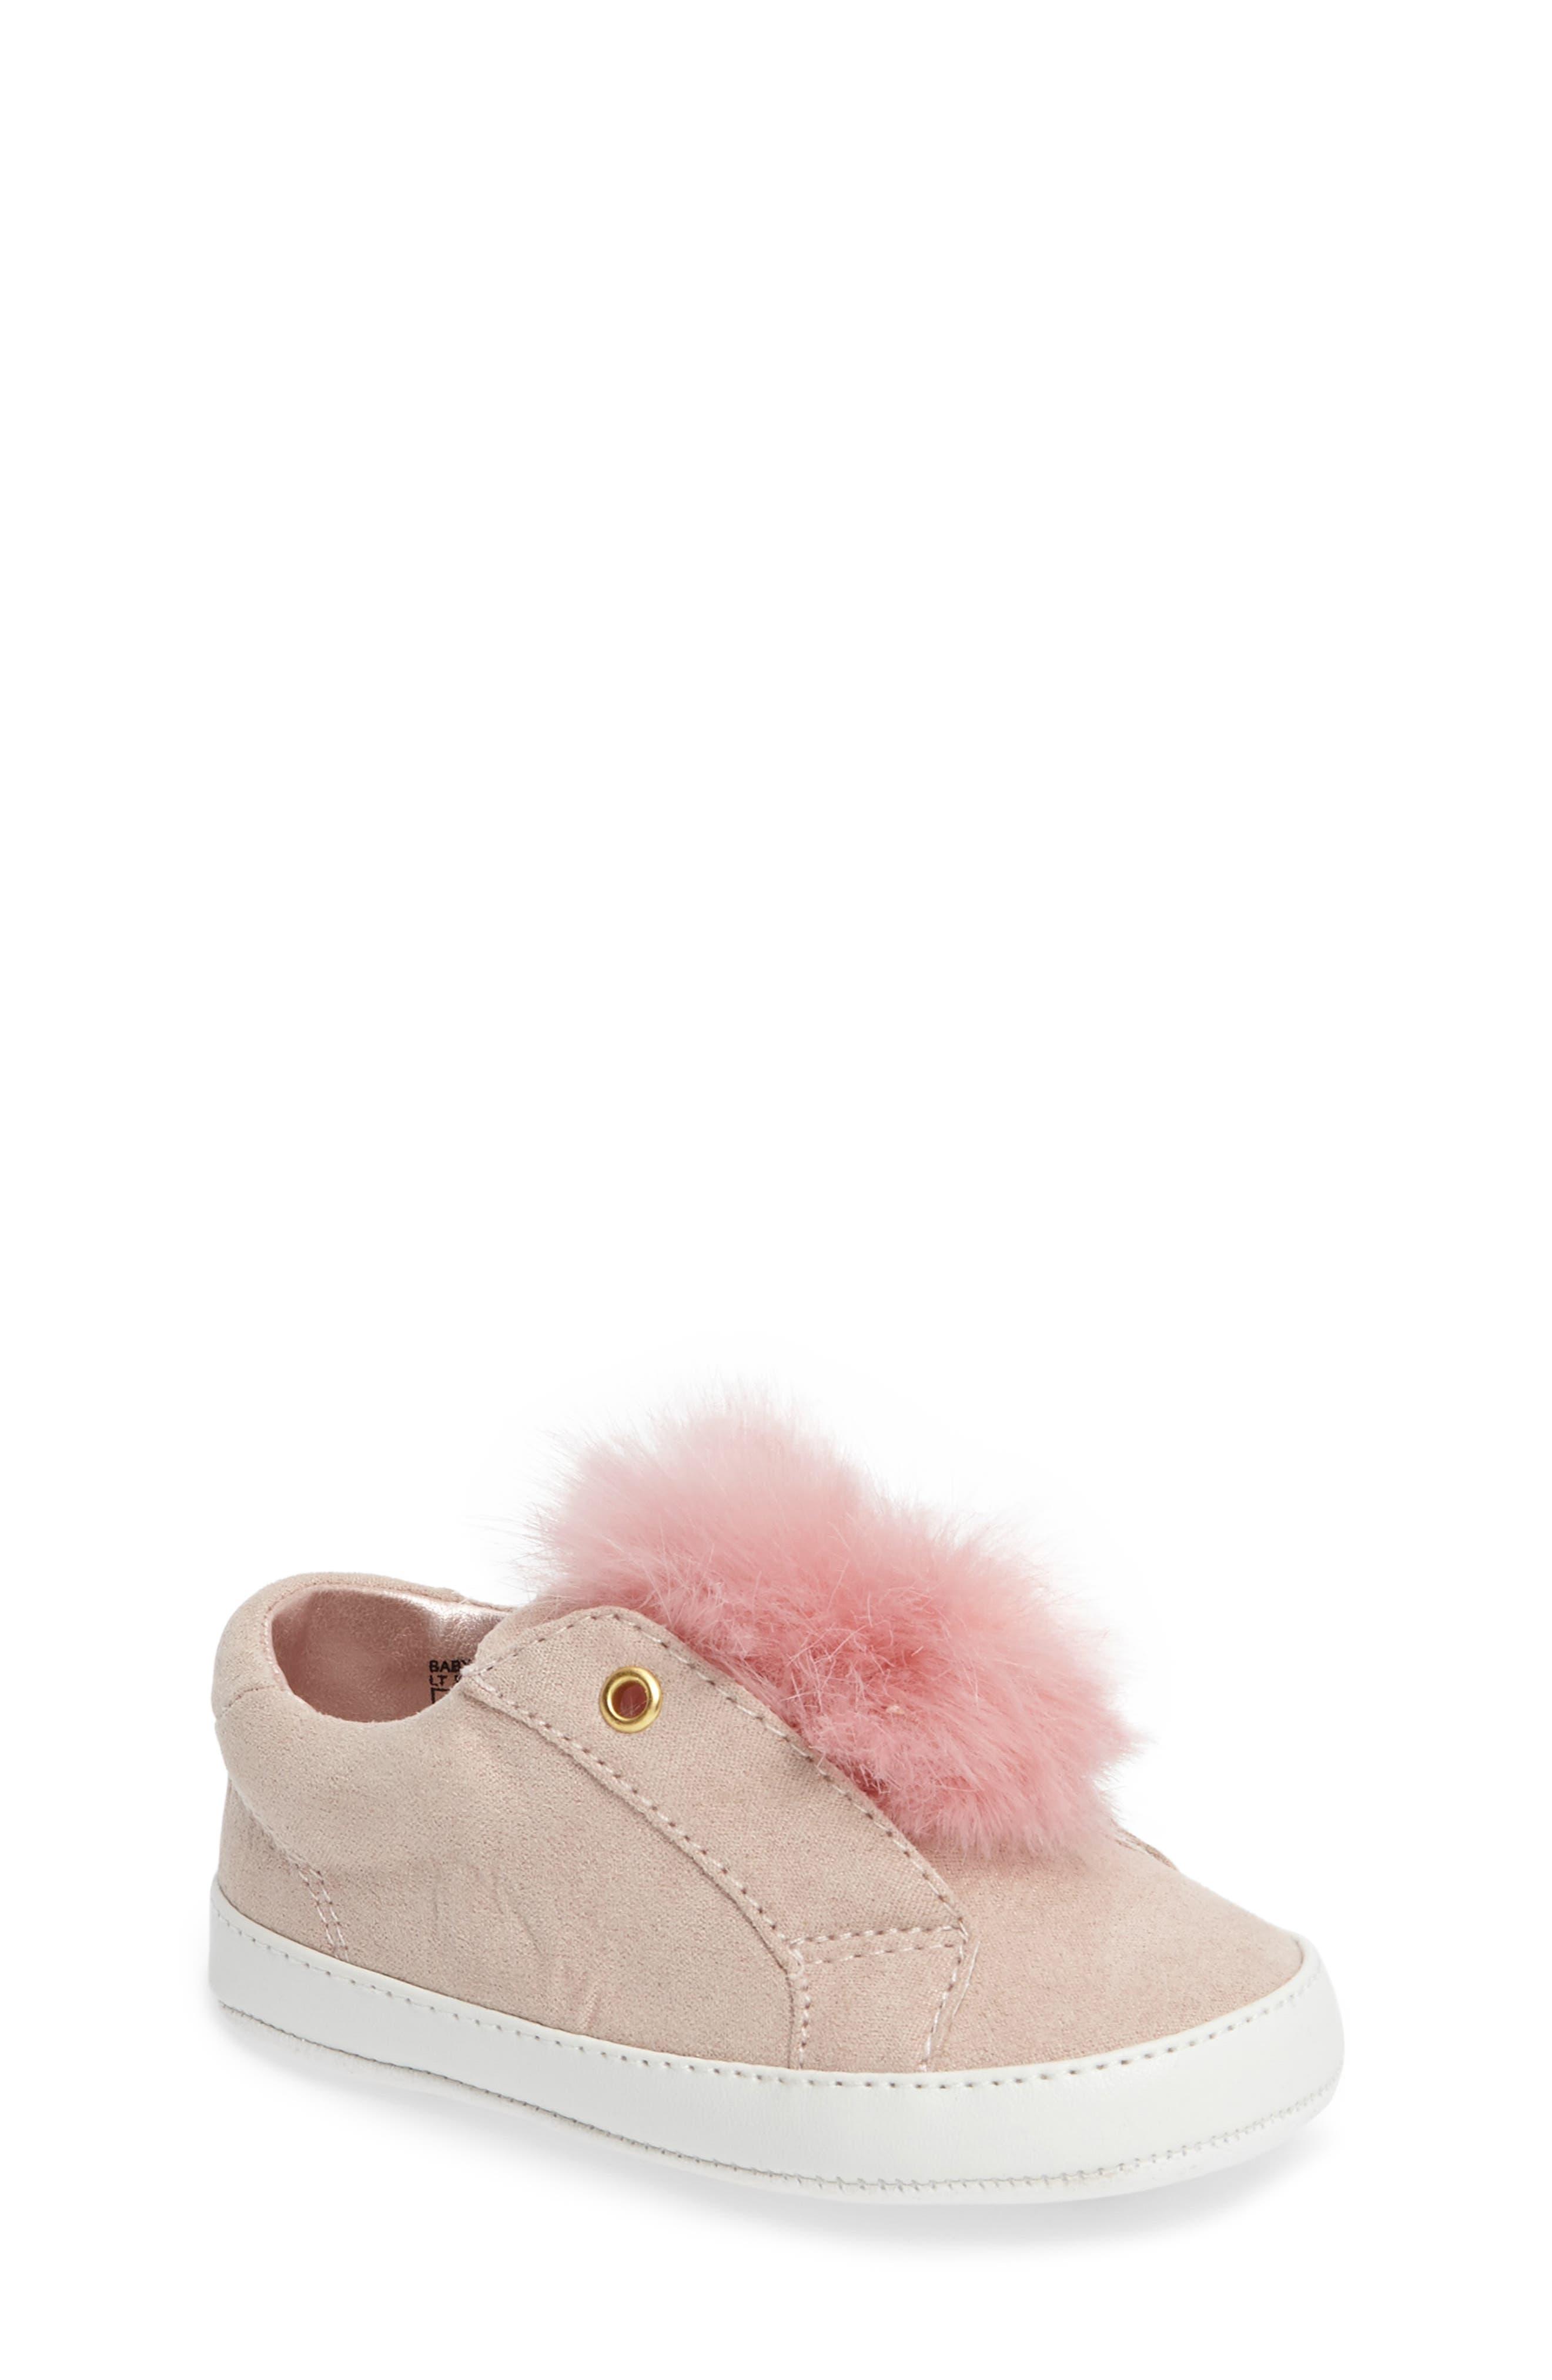 Alternate Image 1 Selected - Sam Edelman Leya Faux Fur Pompom Sneaker (Baby)